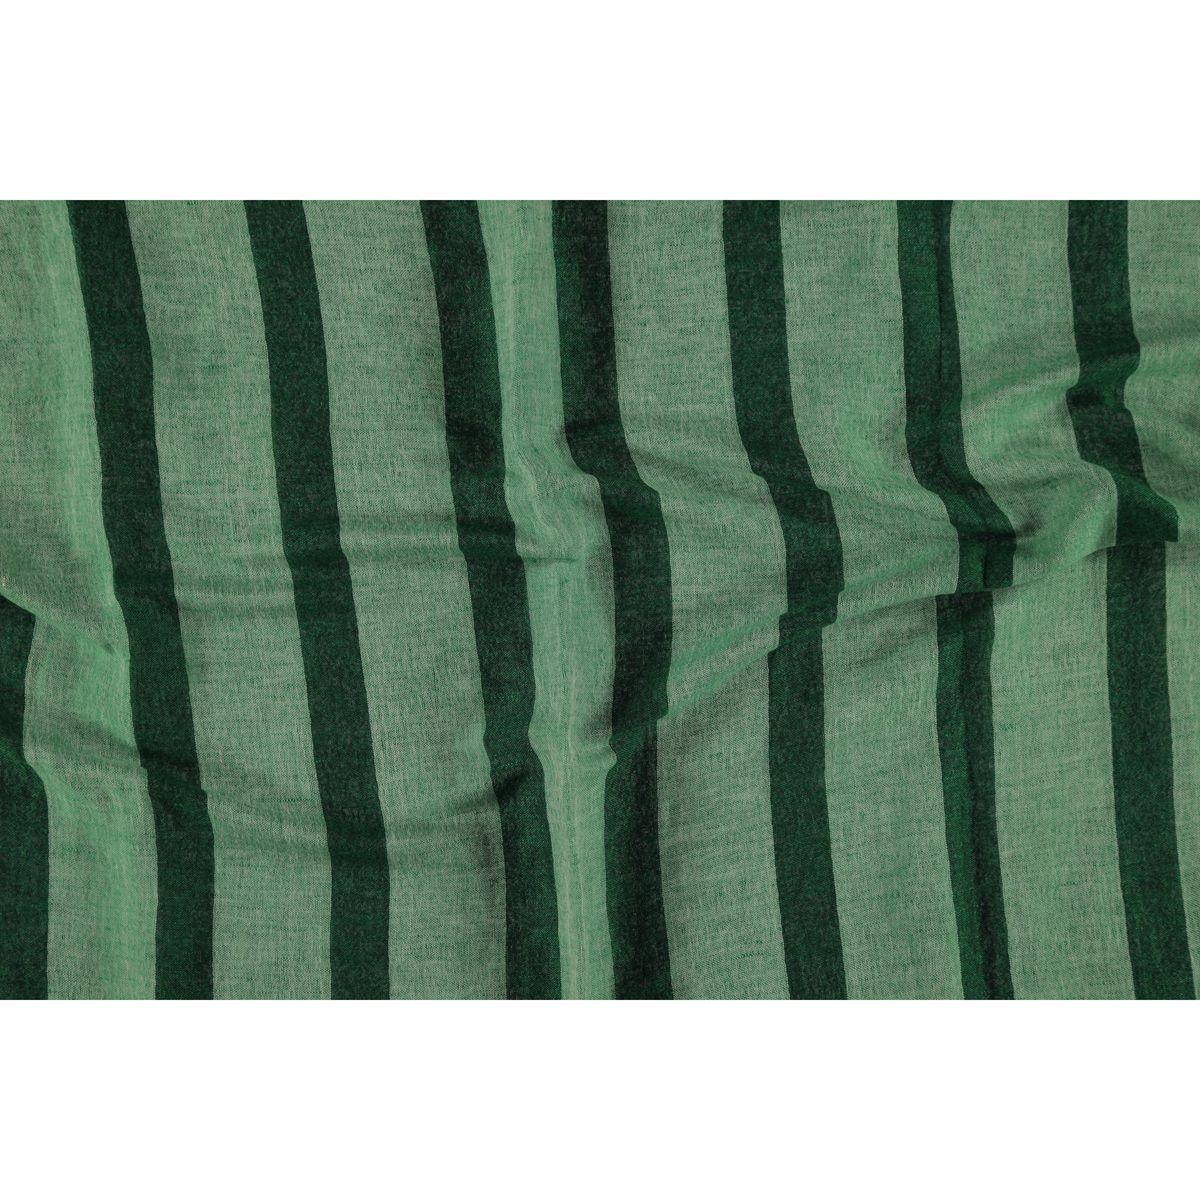 Peştemal / Rıfkı - Yeşil